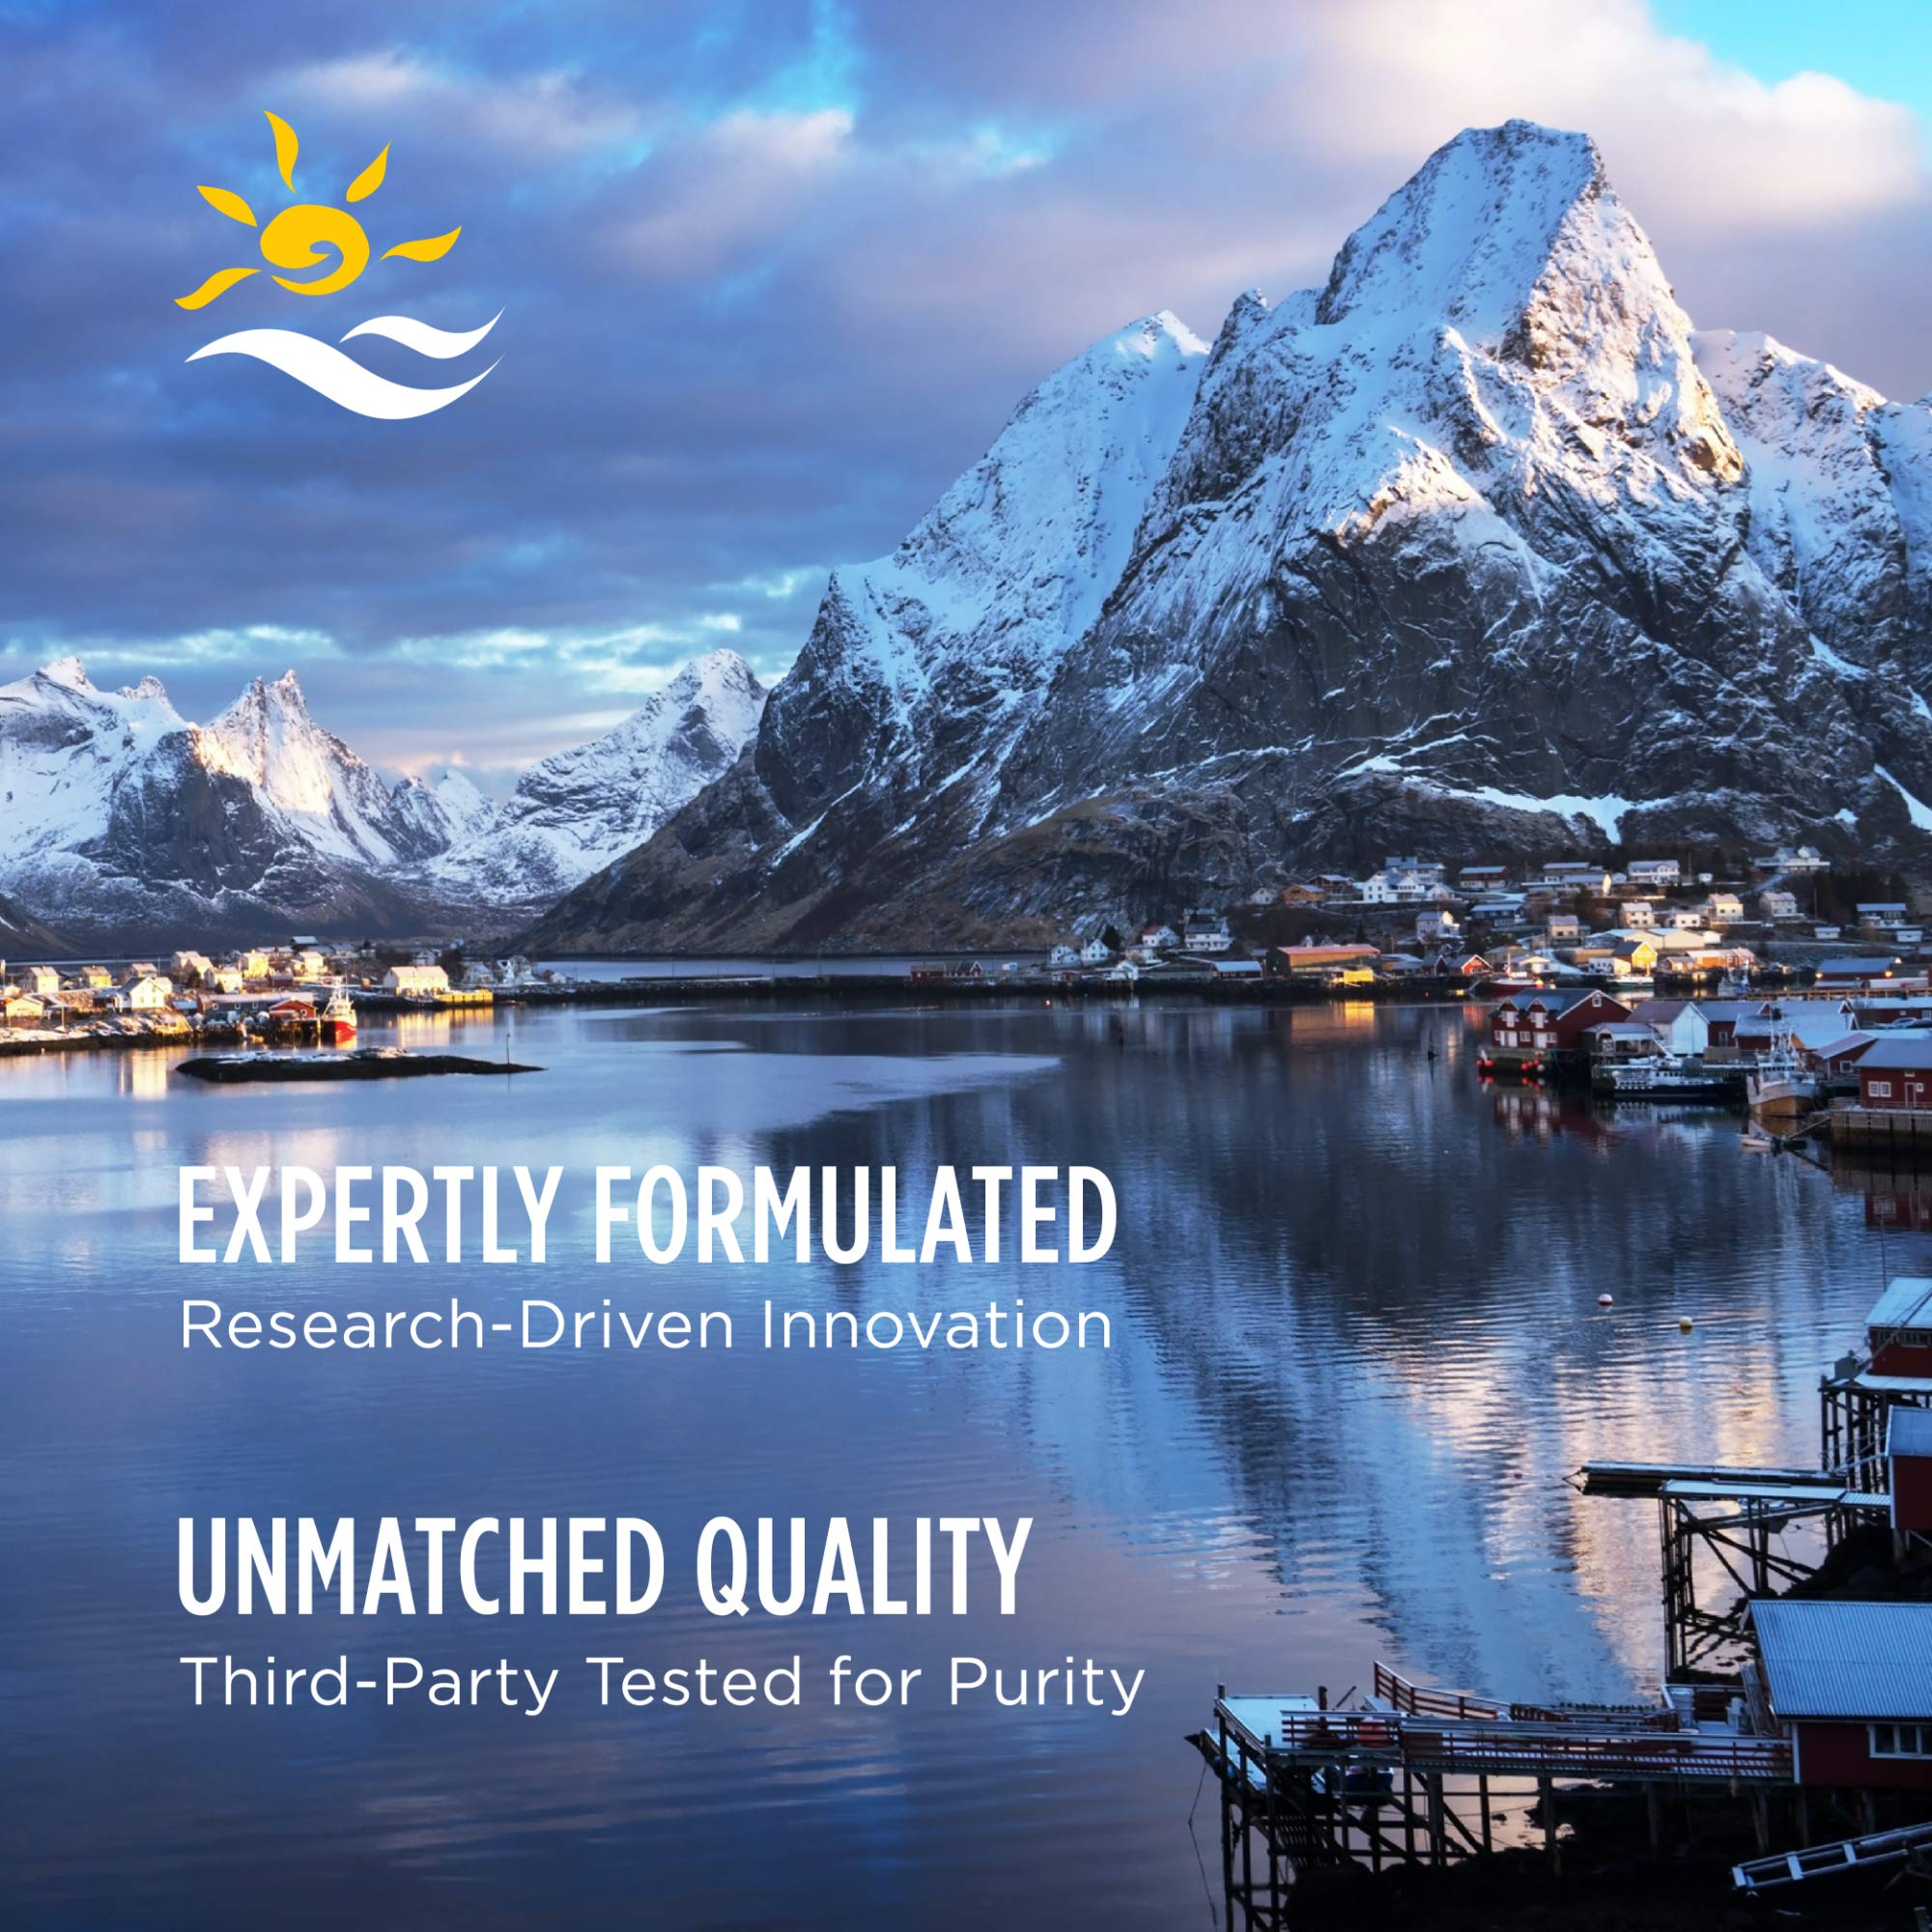 Nordic Naturals Vitamin D3 5000, Orange - 5000 IU Vitamin D3-120 Mini Soft Gels - Supports Healthy Bones, Mood & Immune System Function - Non-GMO - 120 Servings